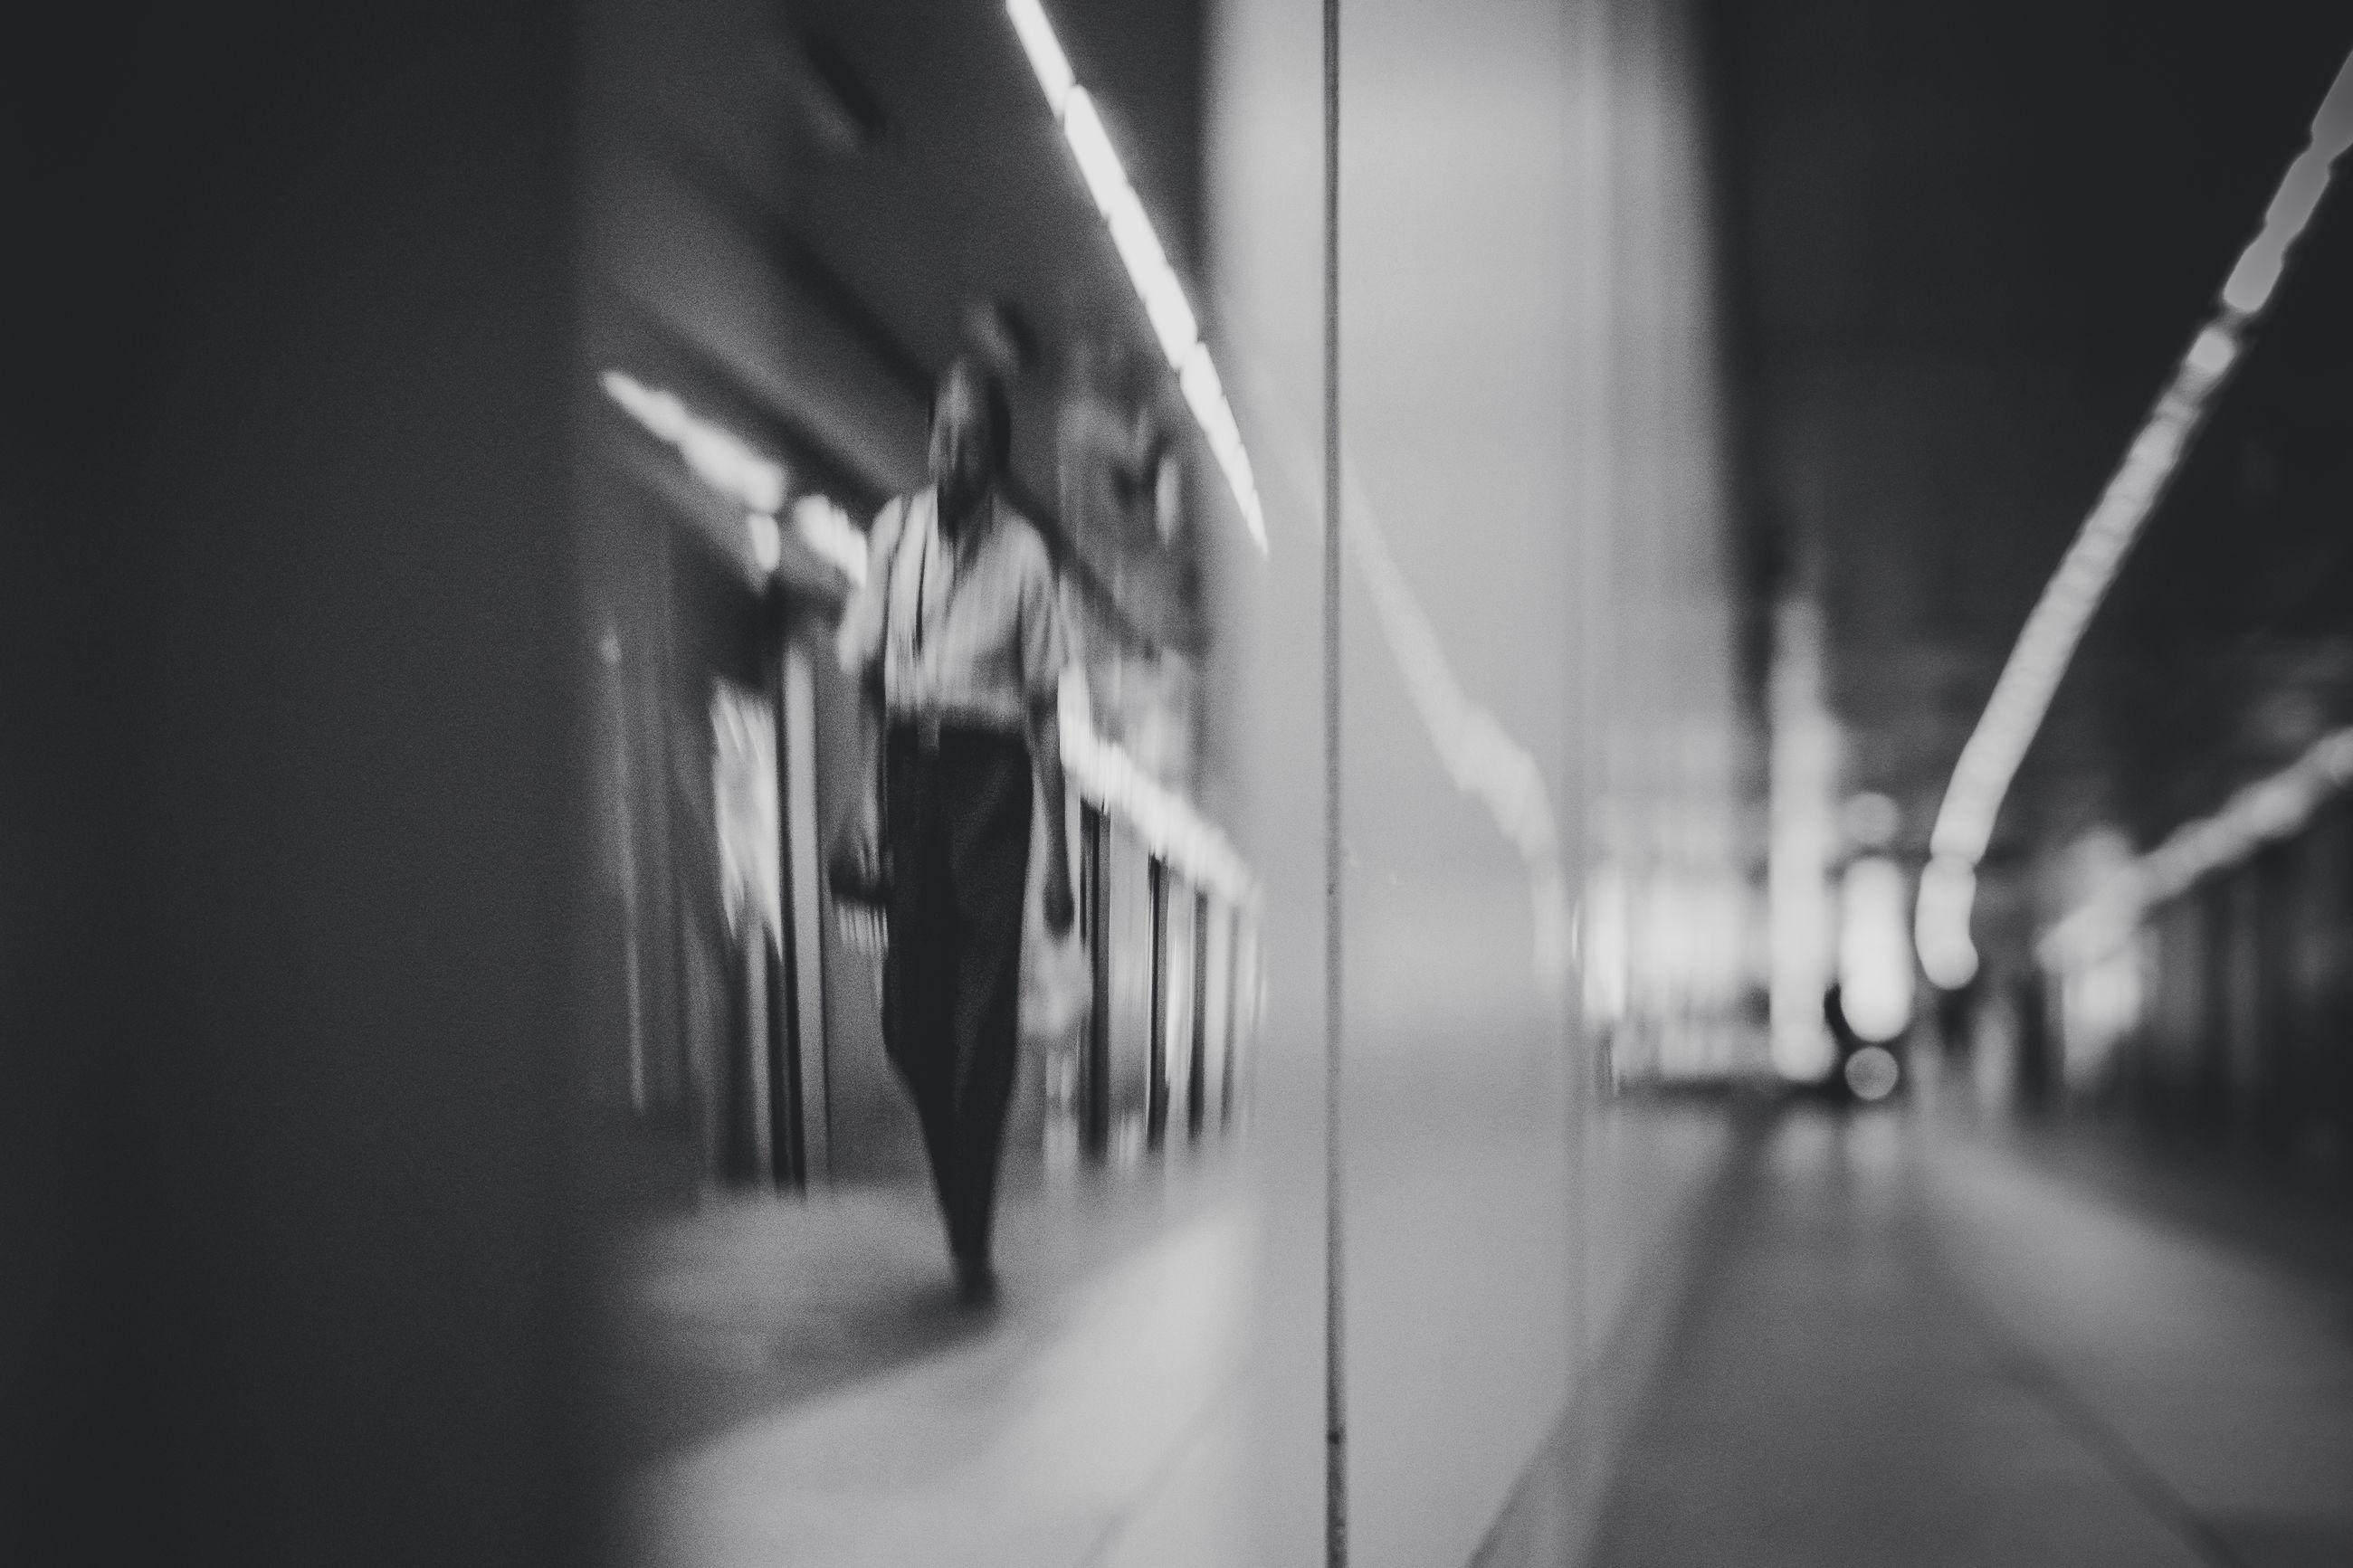 architecture, blurred motion, motion, selective focus, transportation, indoors, public transportation, rail transportation, train, no people, mode of transportation, train - vehicle, corridor, defocused, arcade, subway, railroad station platform, built structure, subway train